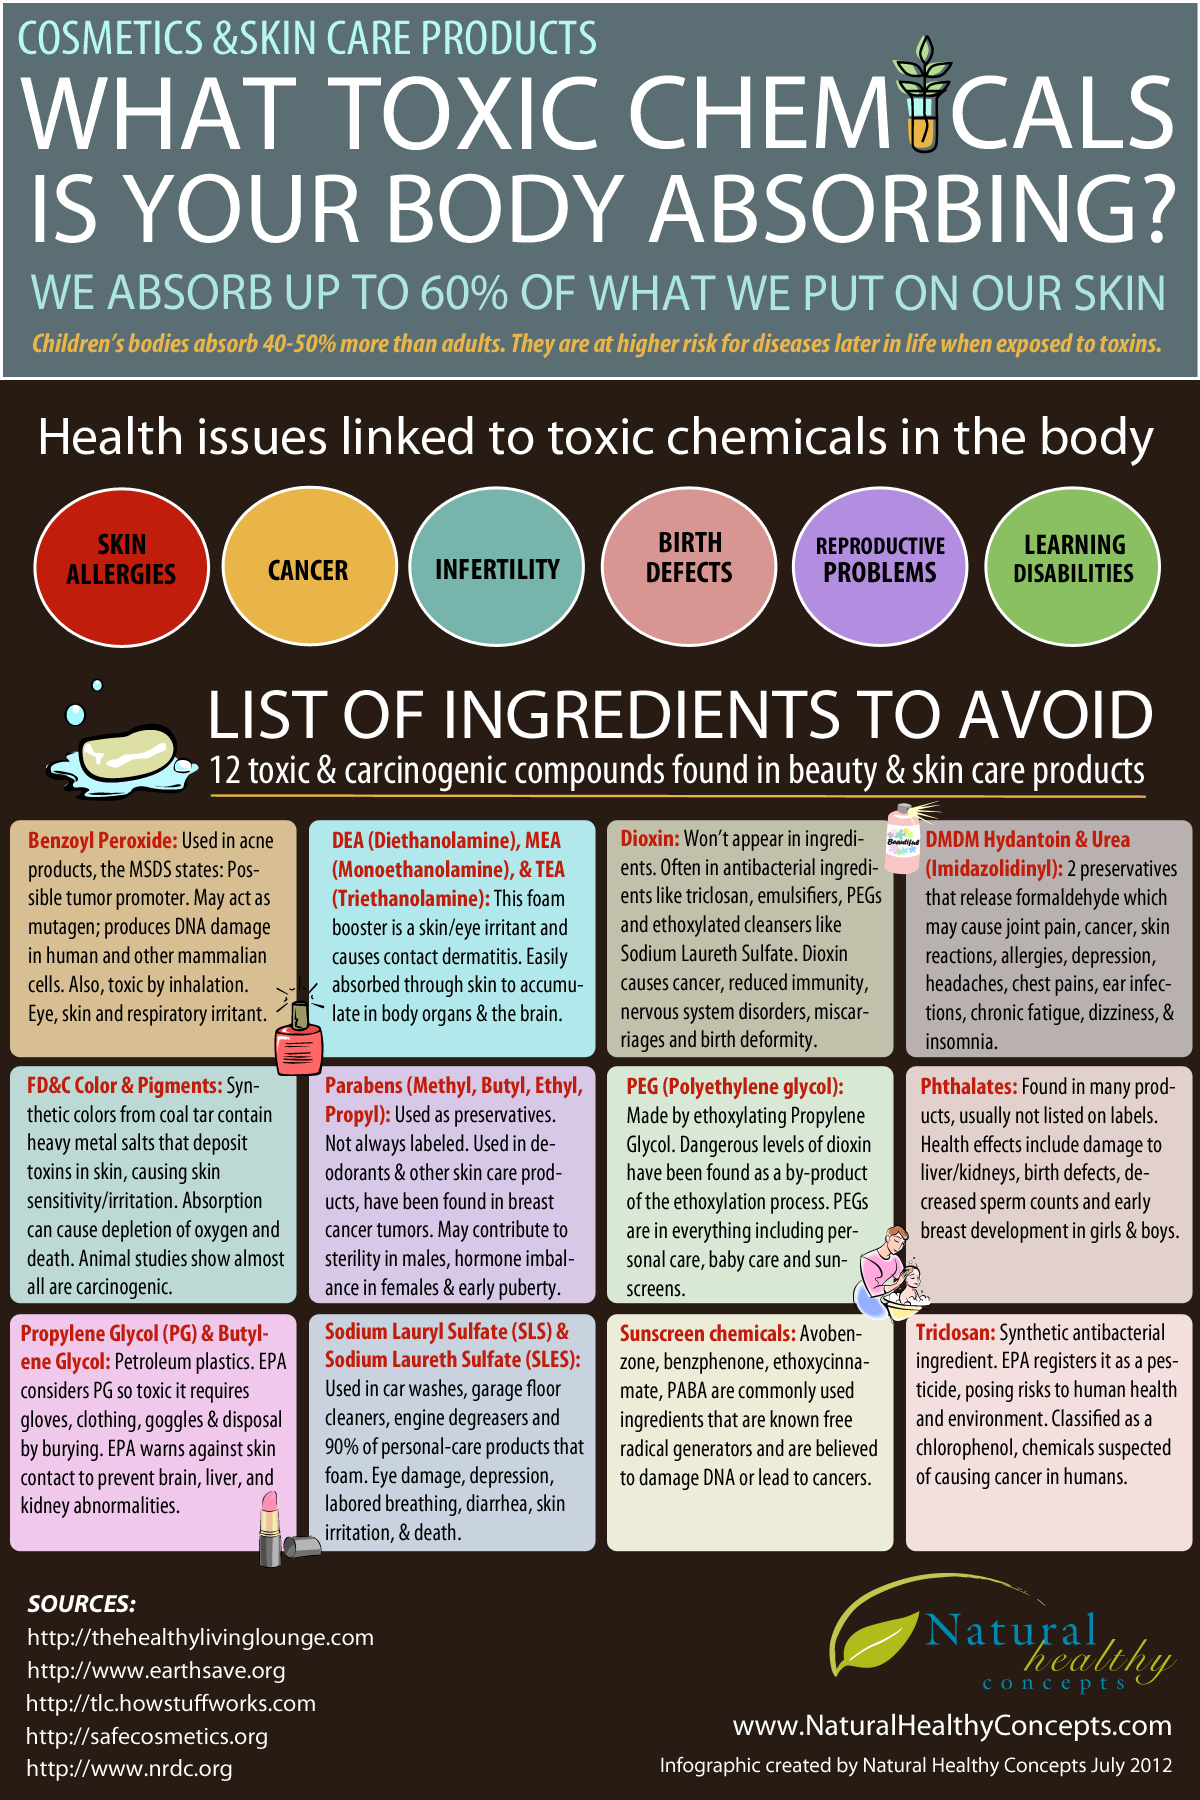 toxic-skin-infographic-ingredients-12-avoid